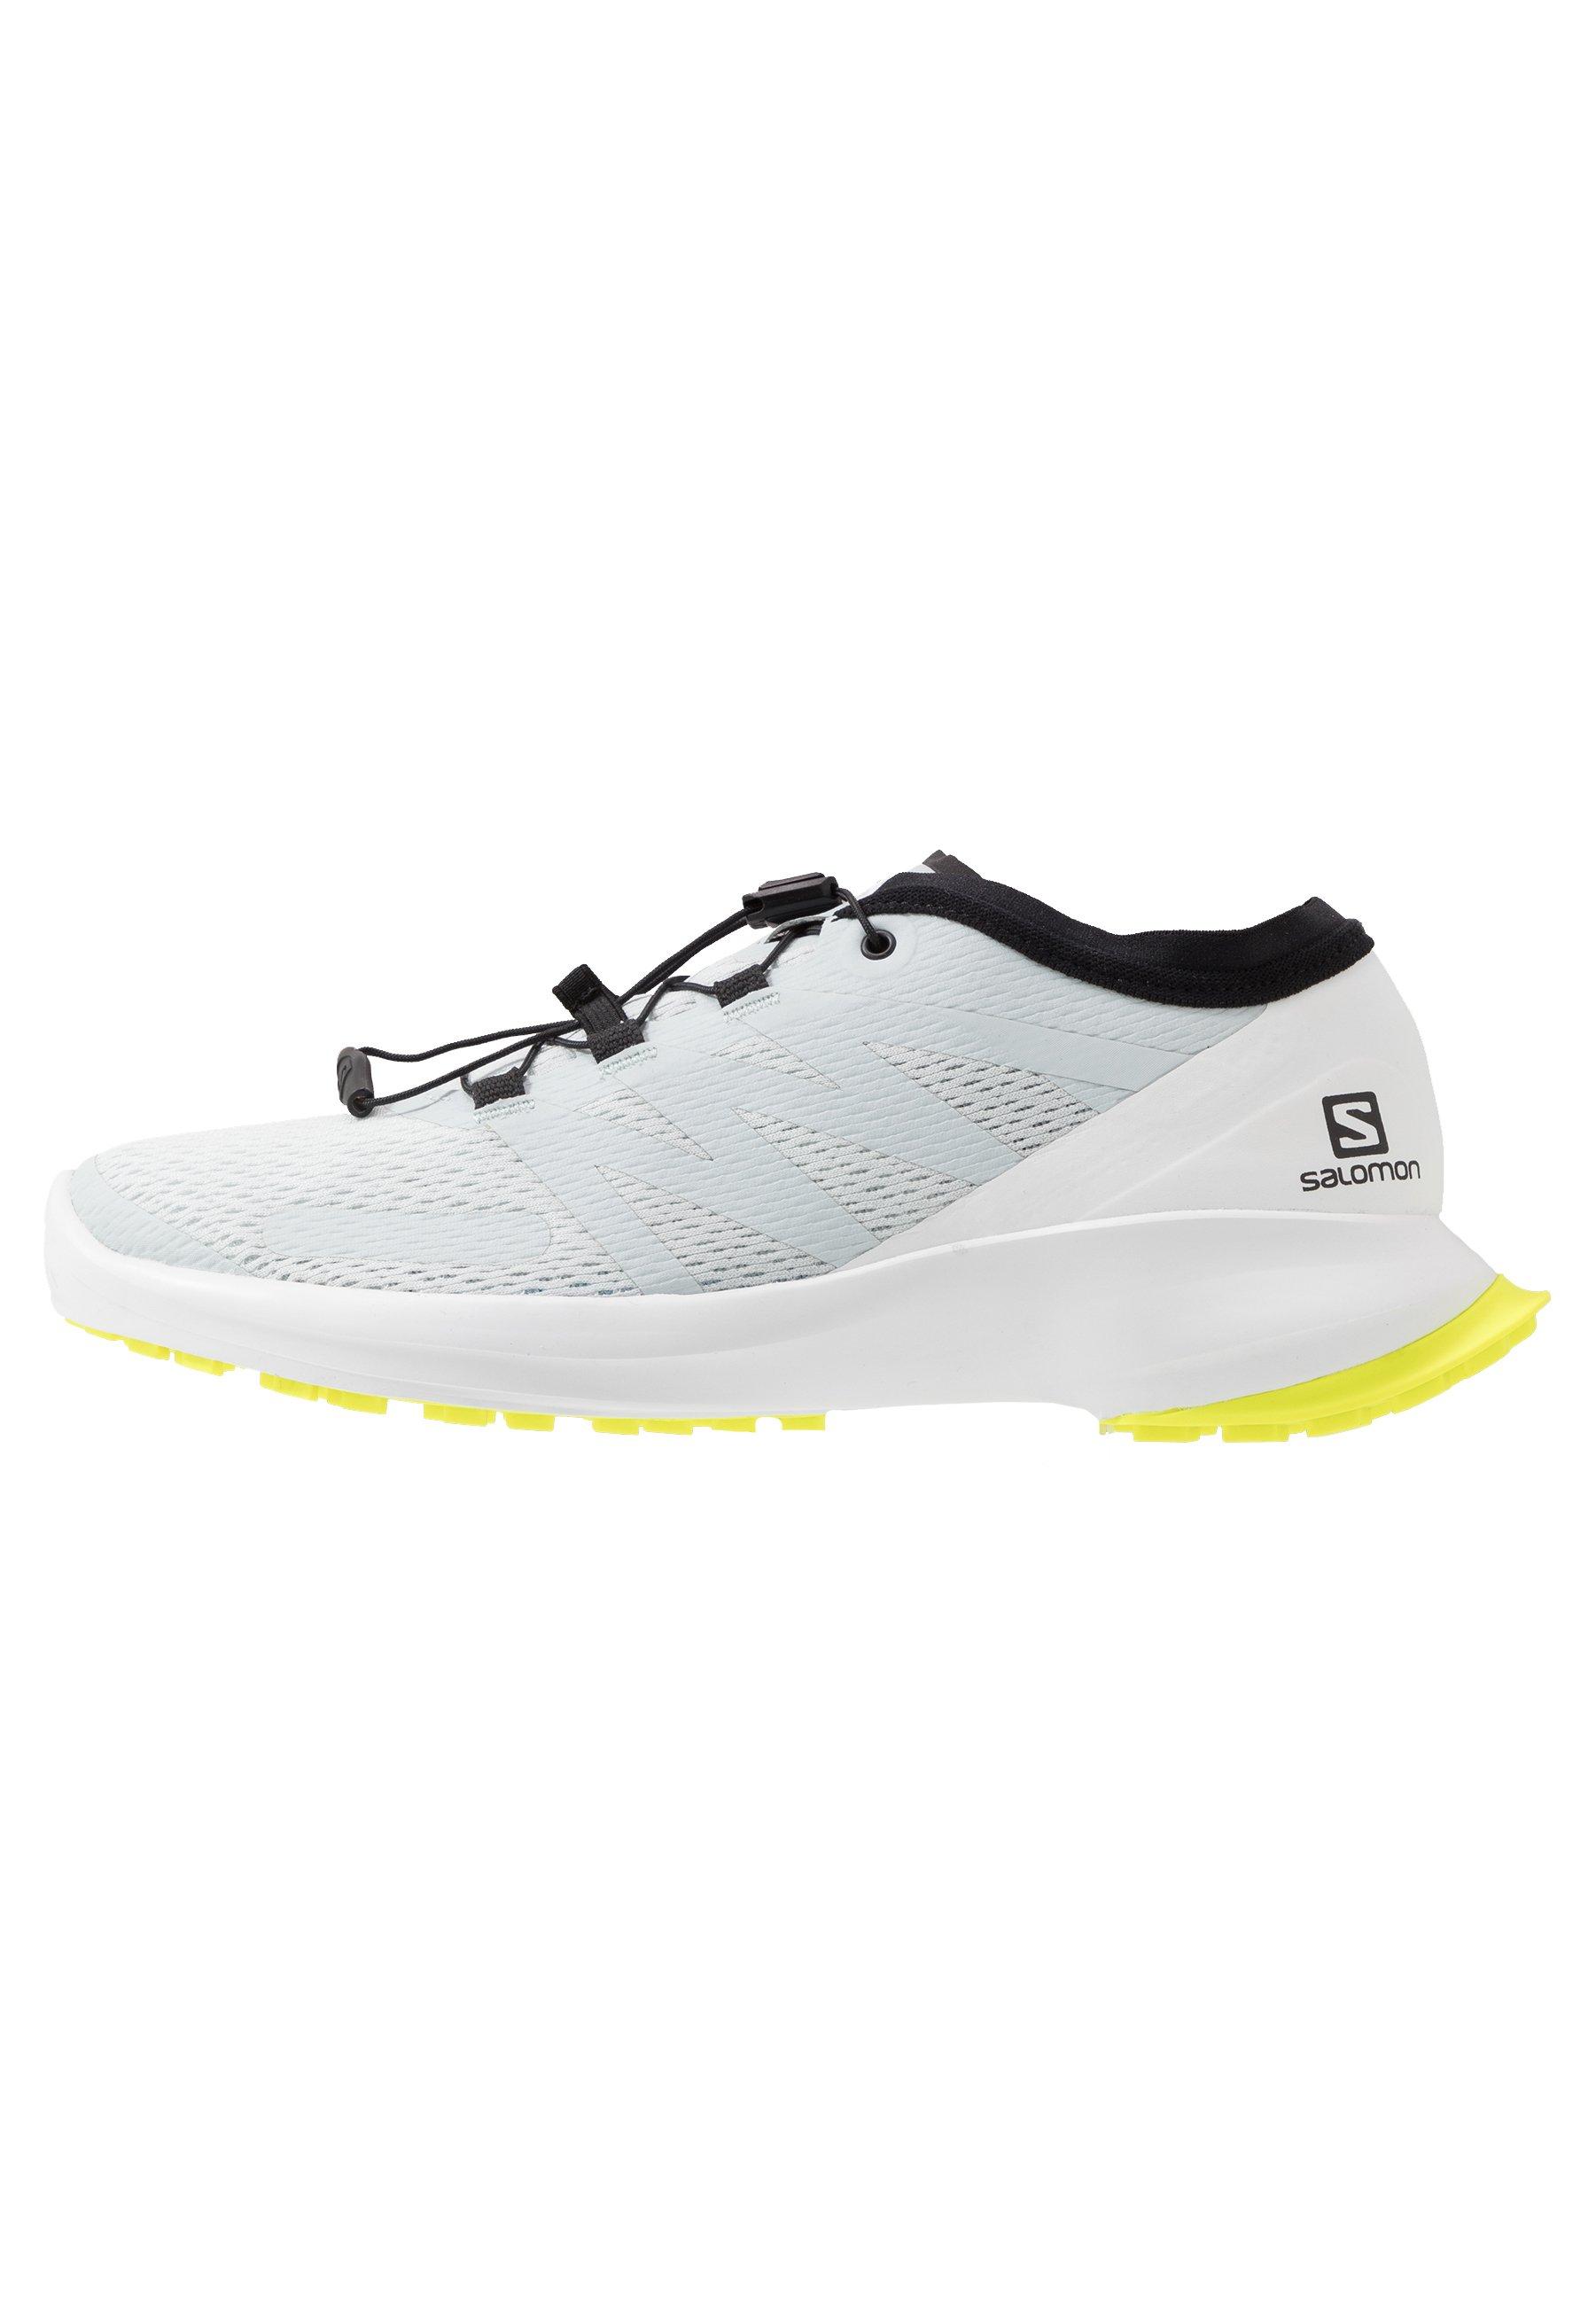 SENSE FLOW Chaussures de running illusion bluewhitesafety yellow